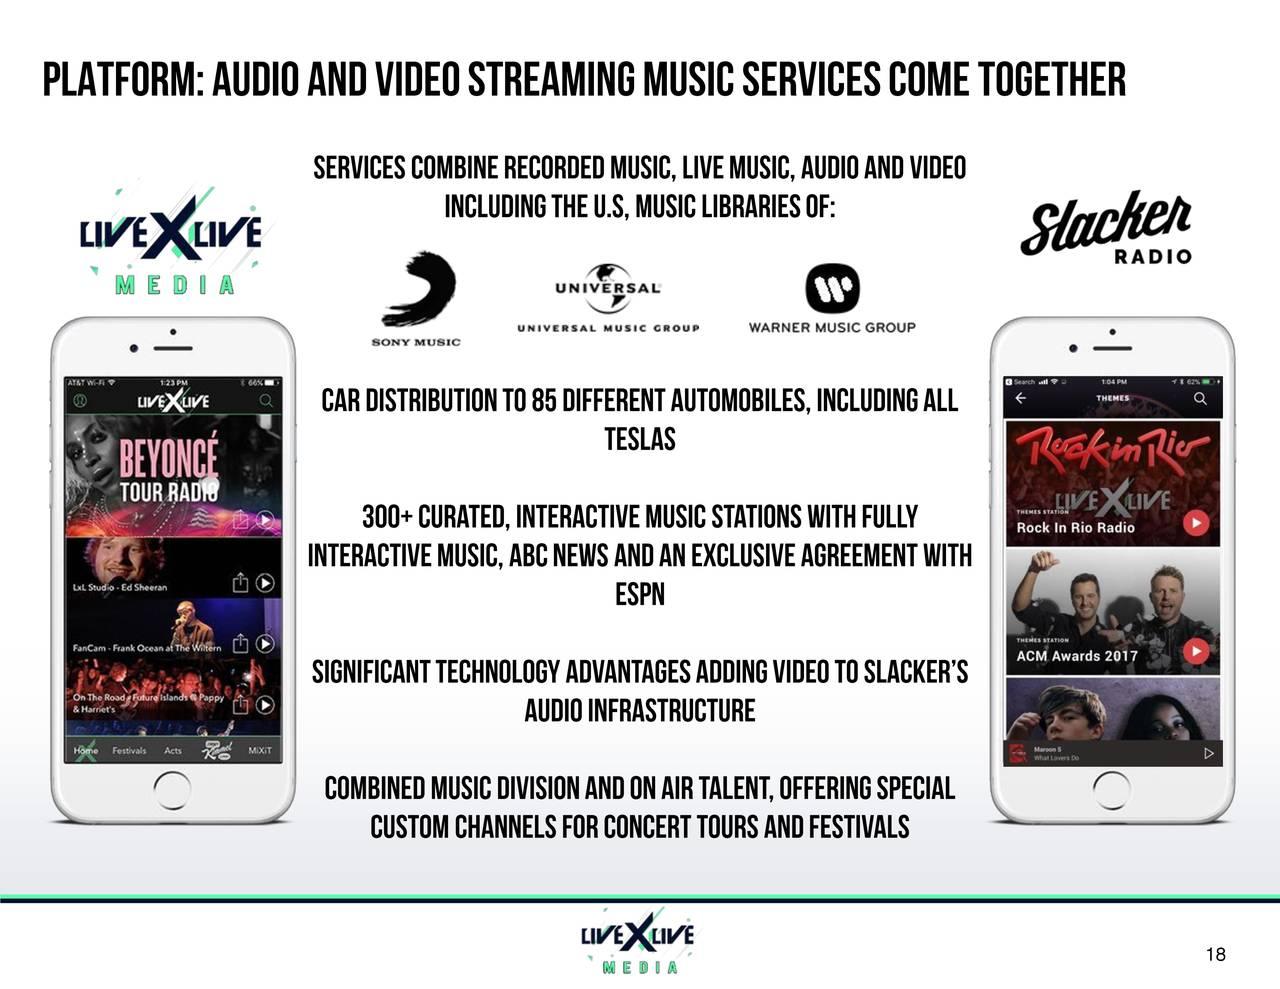 LiveXLive Media (LIVX) Presents At LD Micro Virtual Conference - Slideshow (NASDAQ:LIVX) | Seeking Alpha